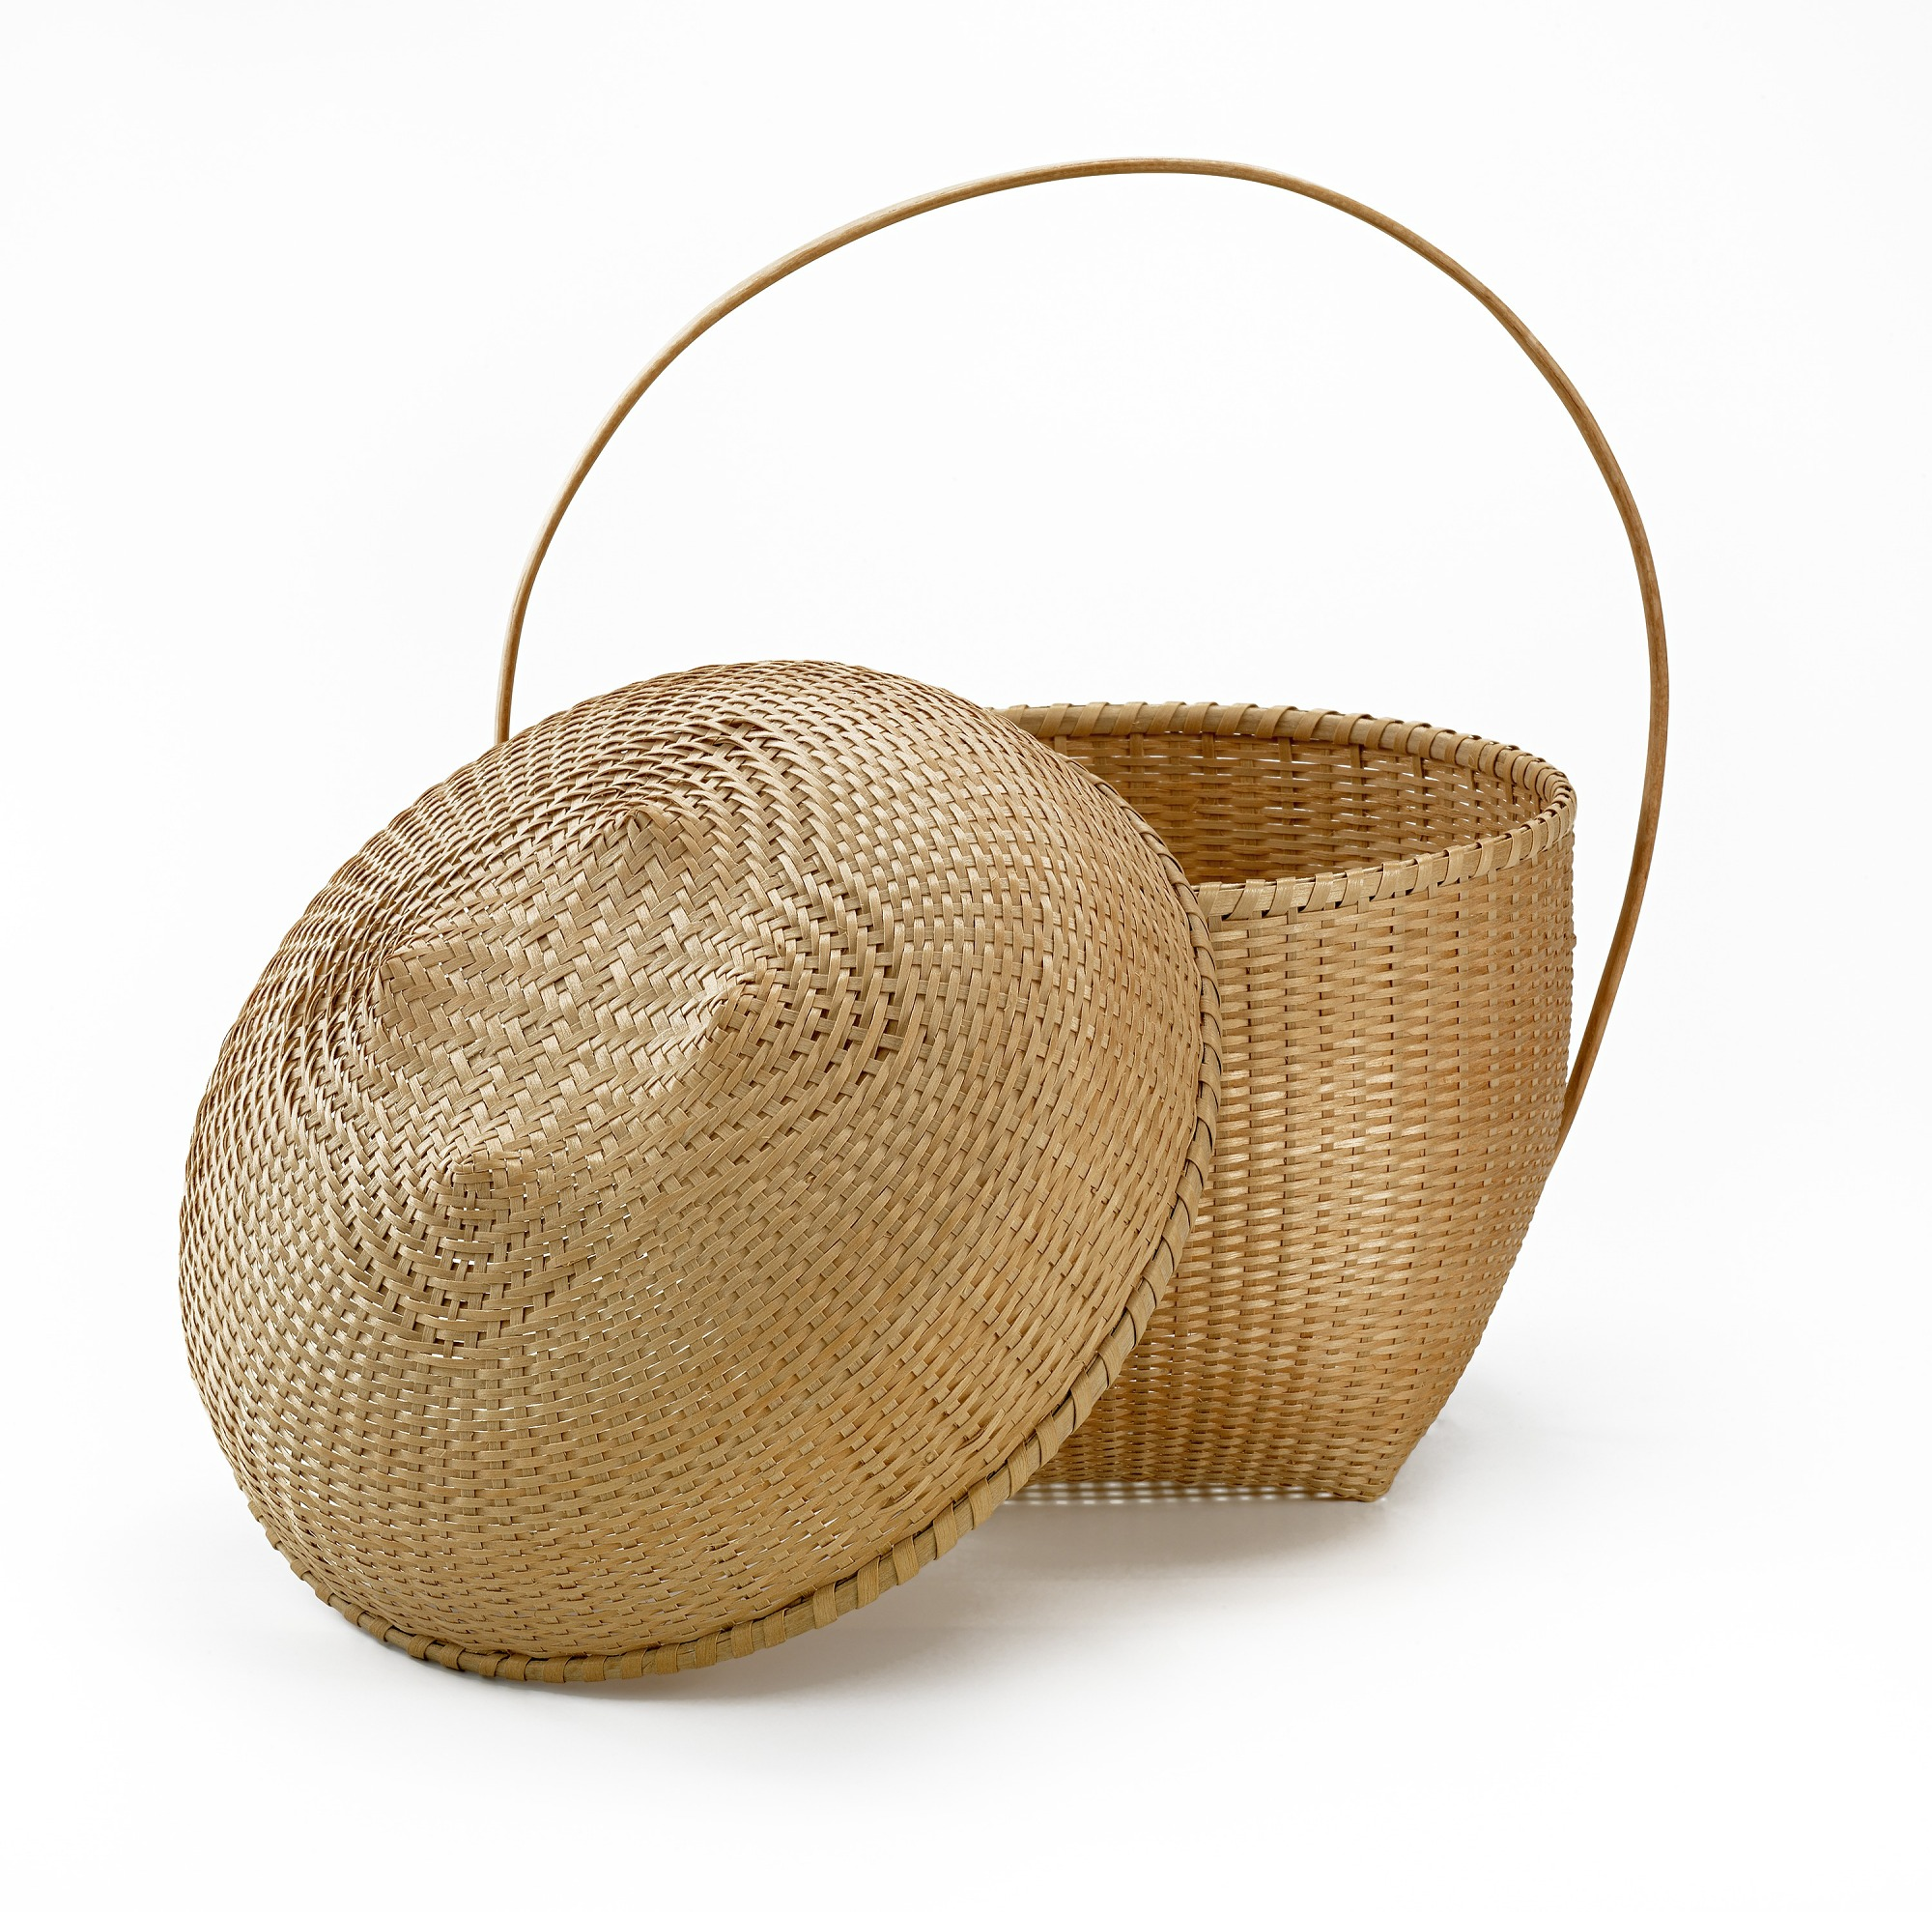 images for Quatrefoil Lidded Shaker Cat Head Basket with Handle